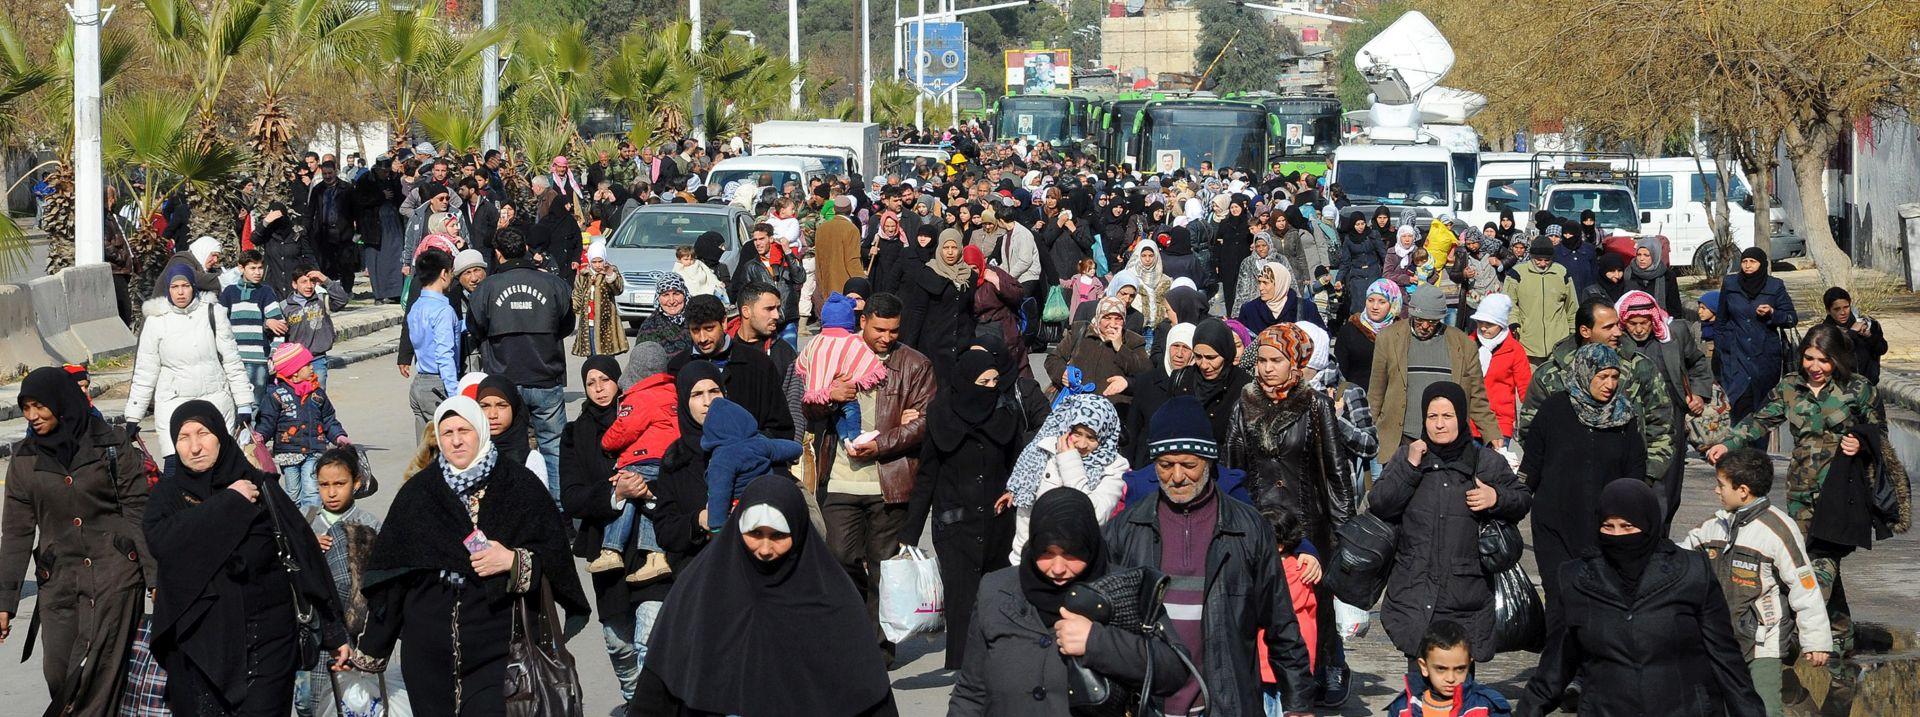 "VELEPOSLANIK: Ukrajina odbacuje tvrdnje Poljske o ""milijun izbjeglica"""